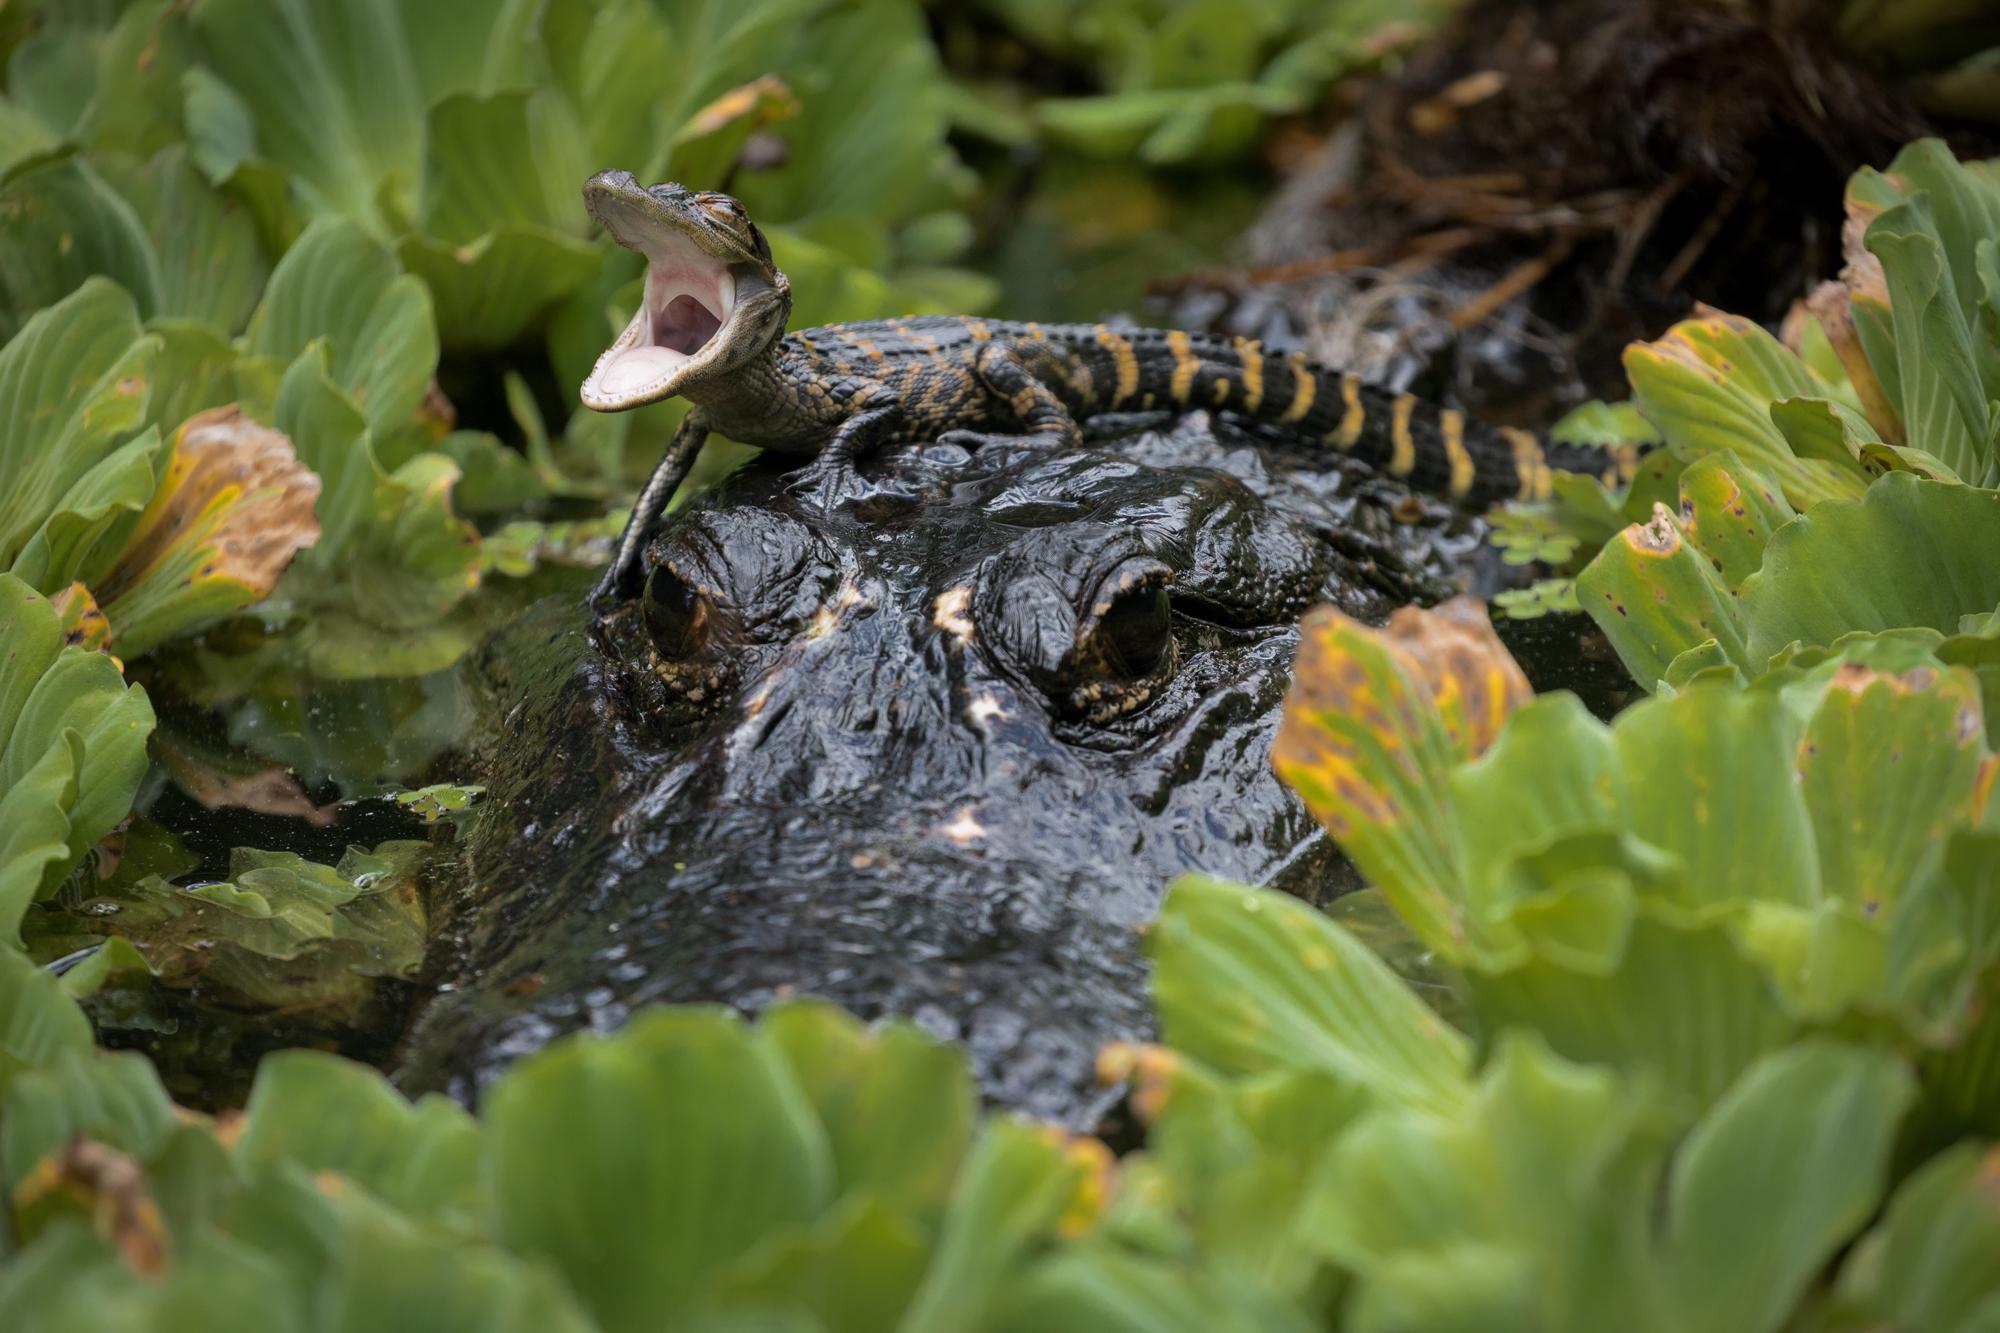 Baby American Alligator